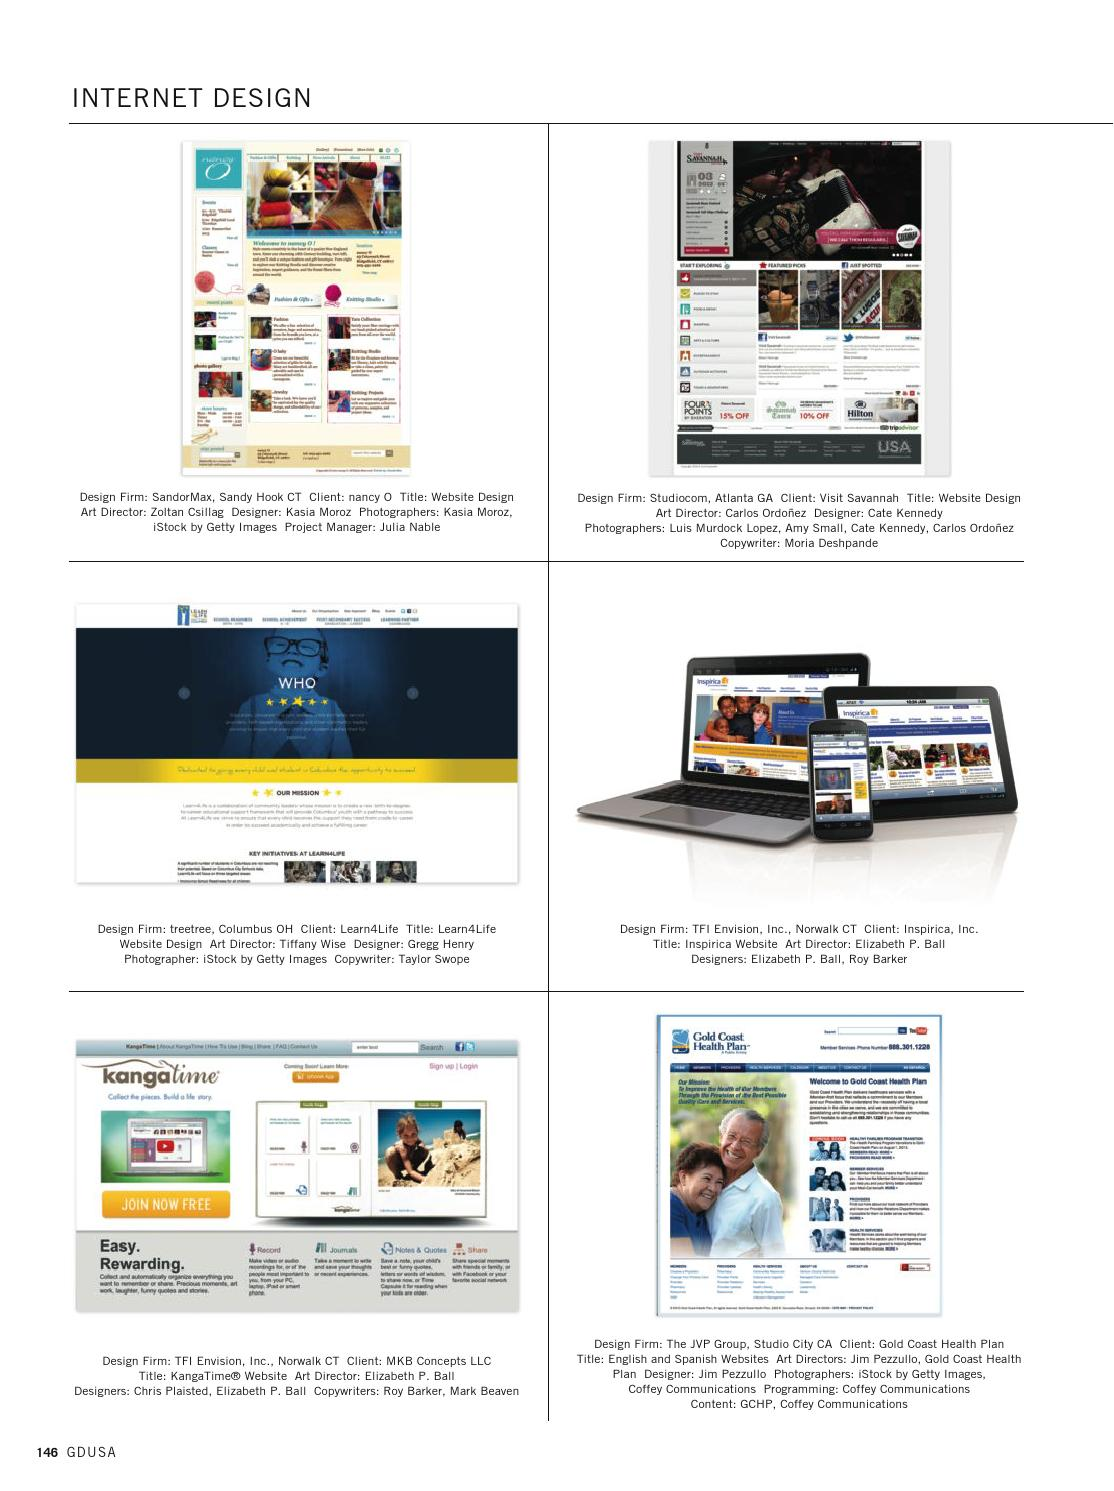 GDUSA November/December 2013 Issue by Graphic Design USA - issuu